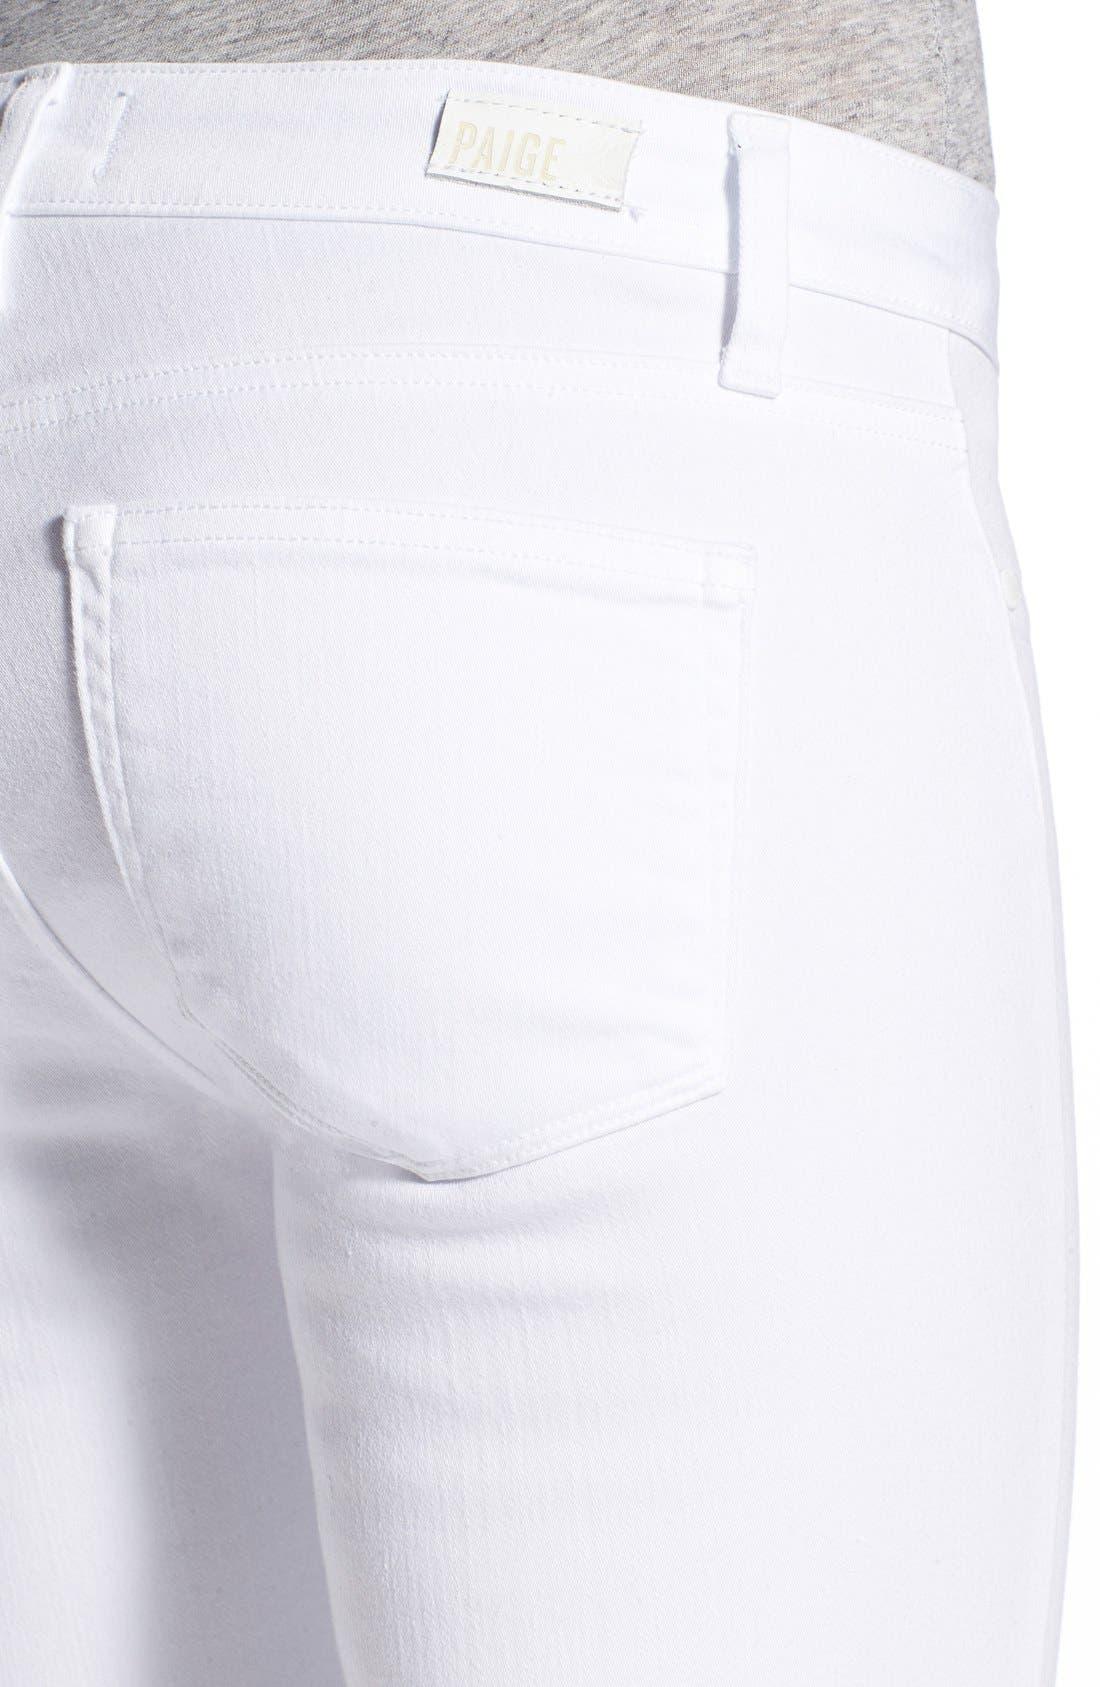 Alternate Image 5  - PAIGE 'Verdugo' Ankle Skinny Jeans (Ultra White)